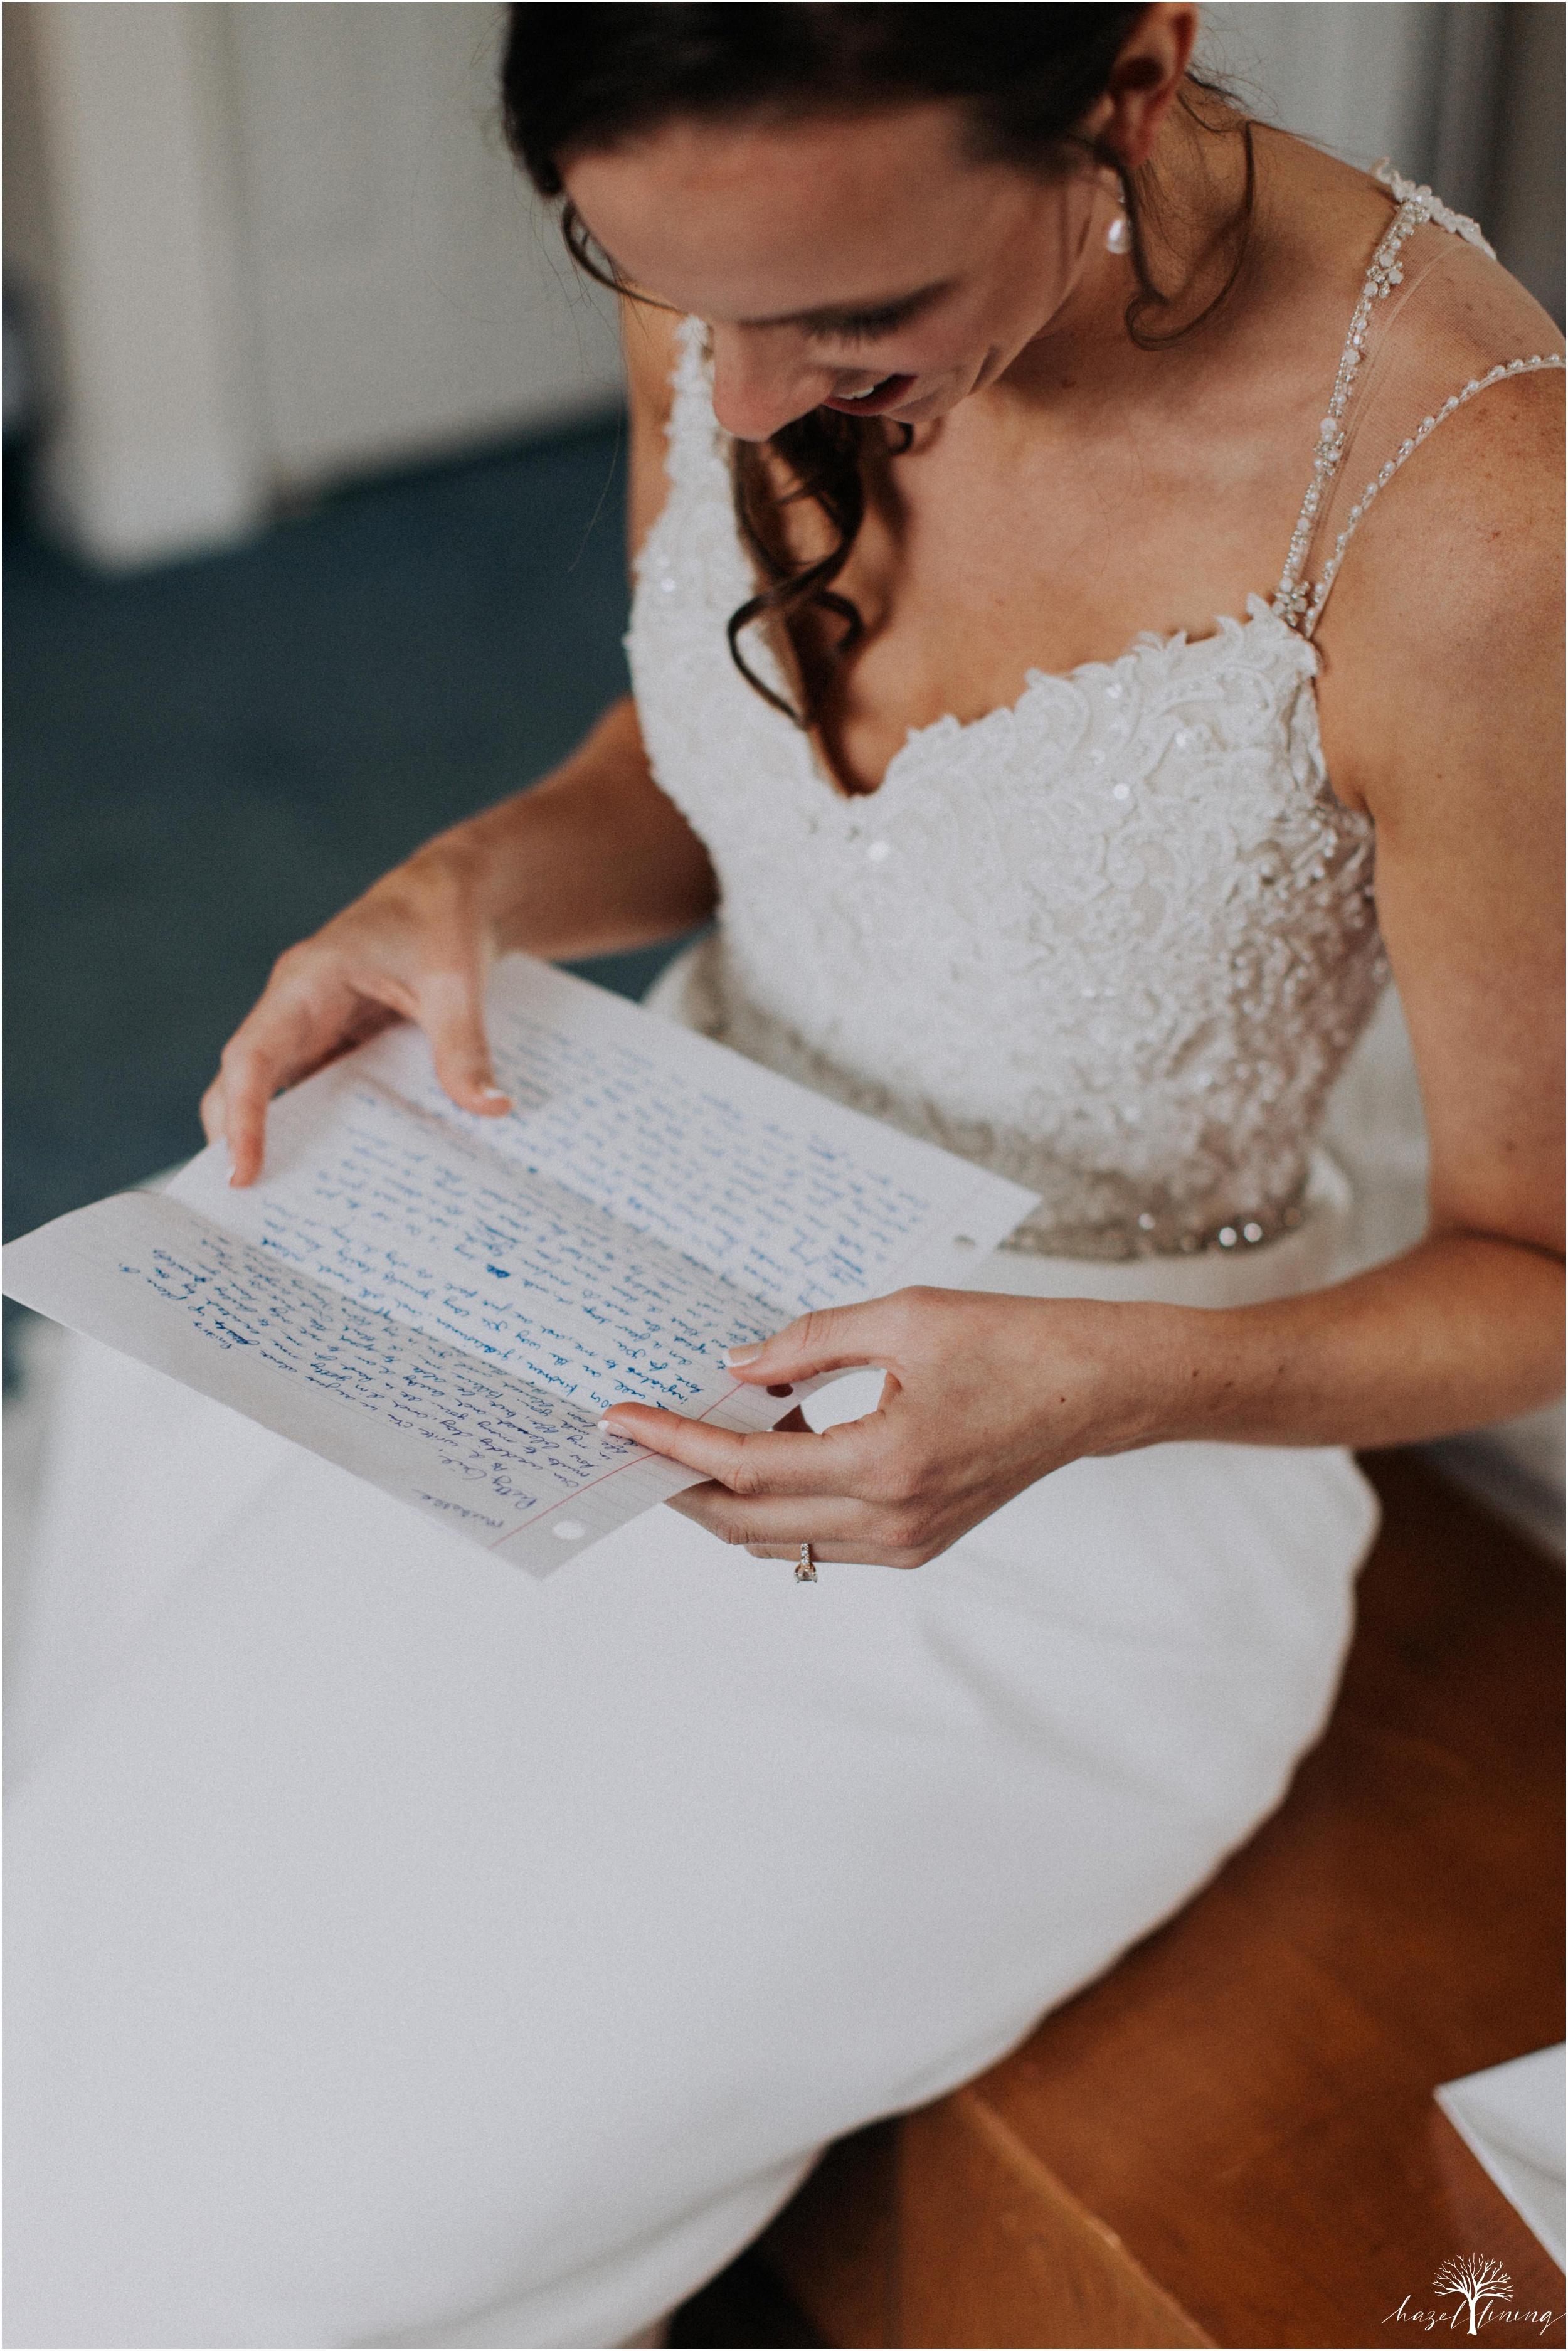 hazel-lining-travel-wedding-elopement-photography_0023.jpg